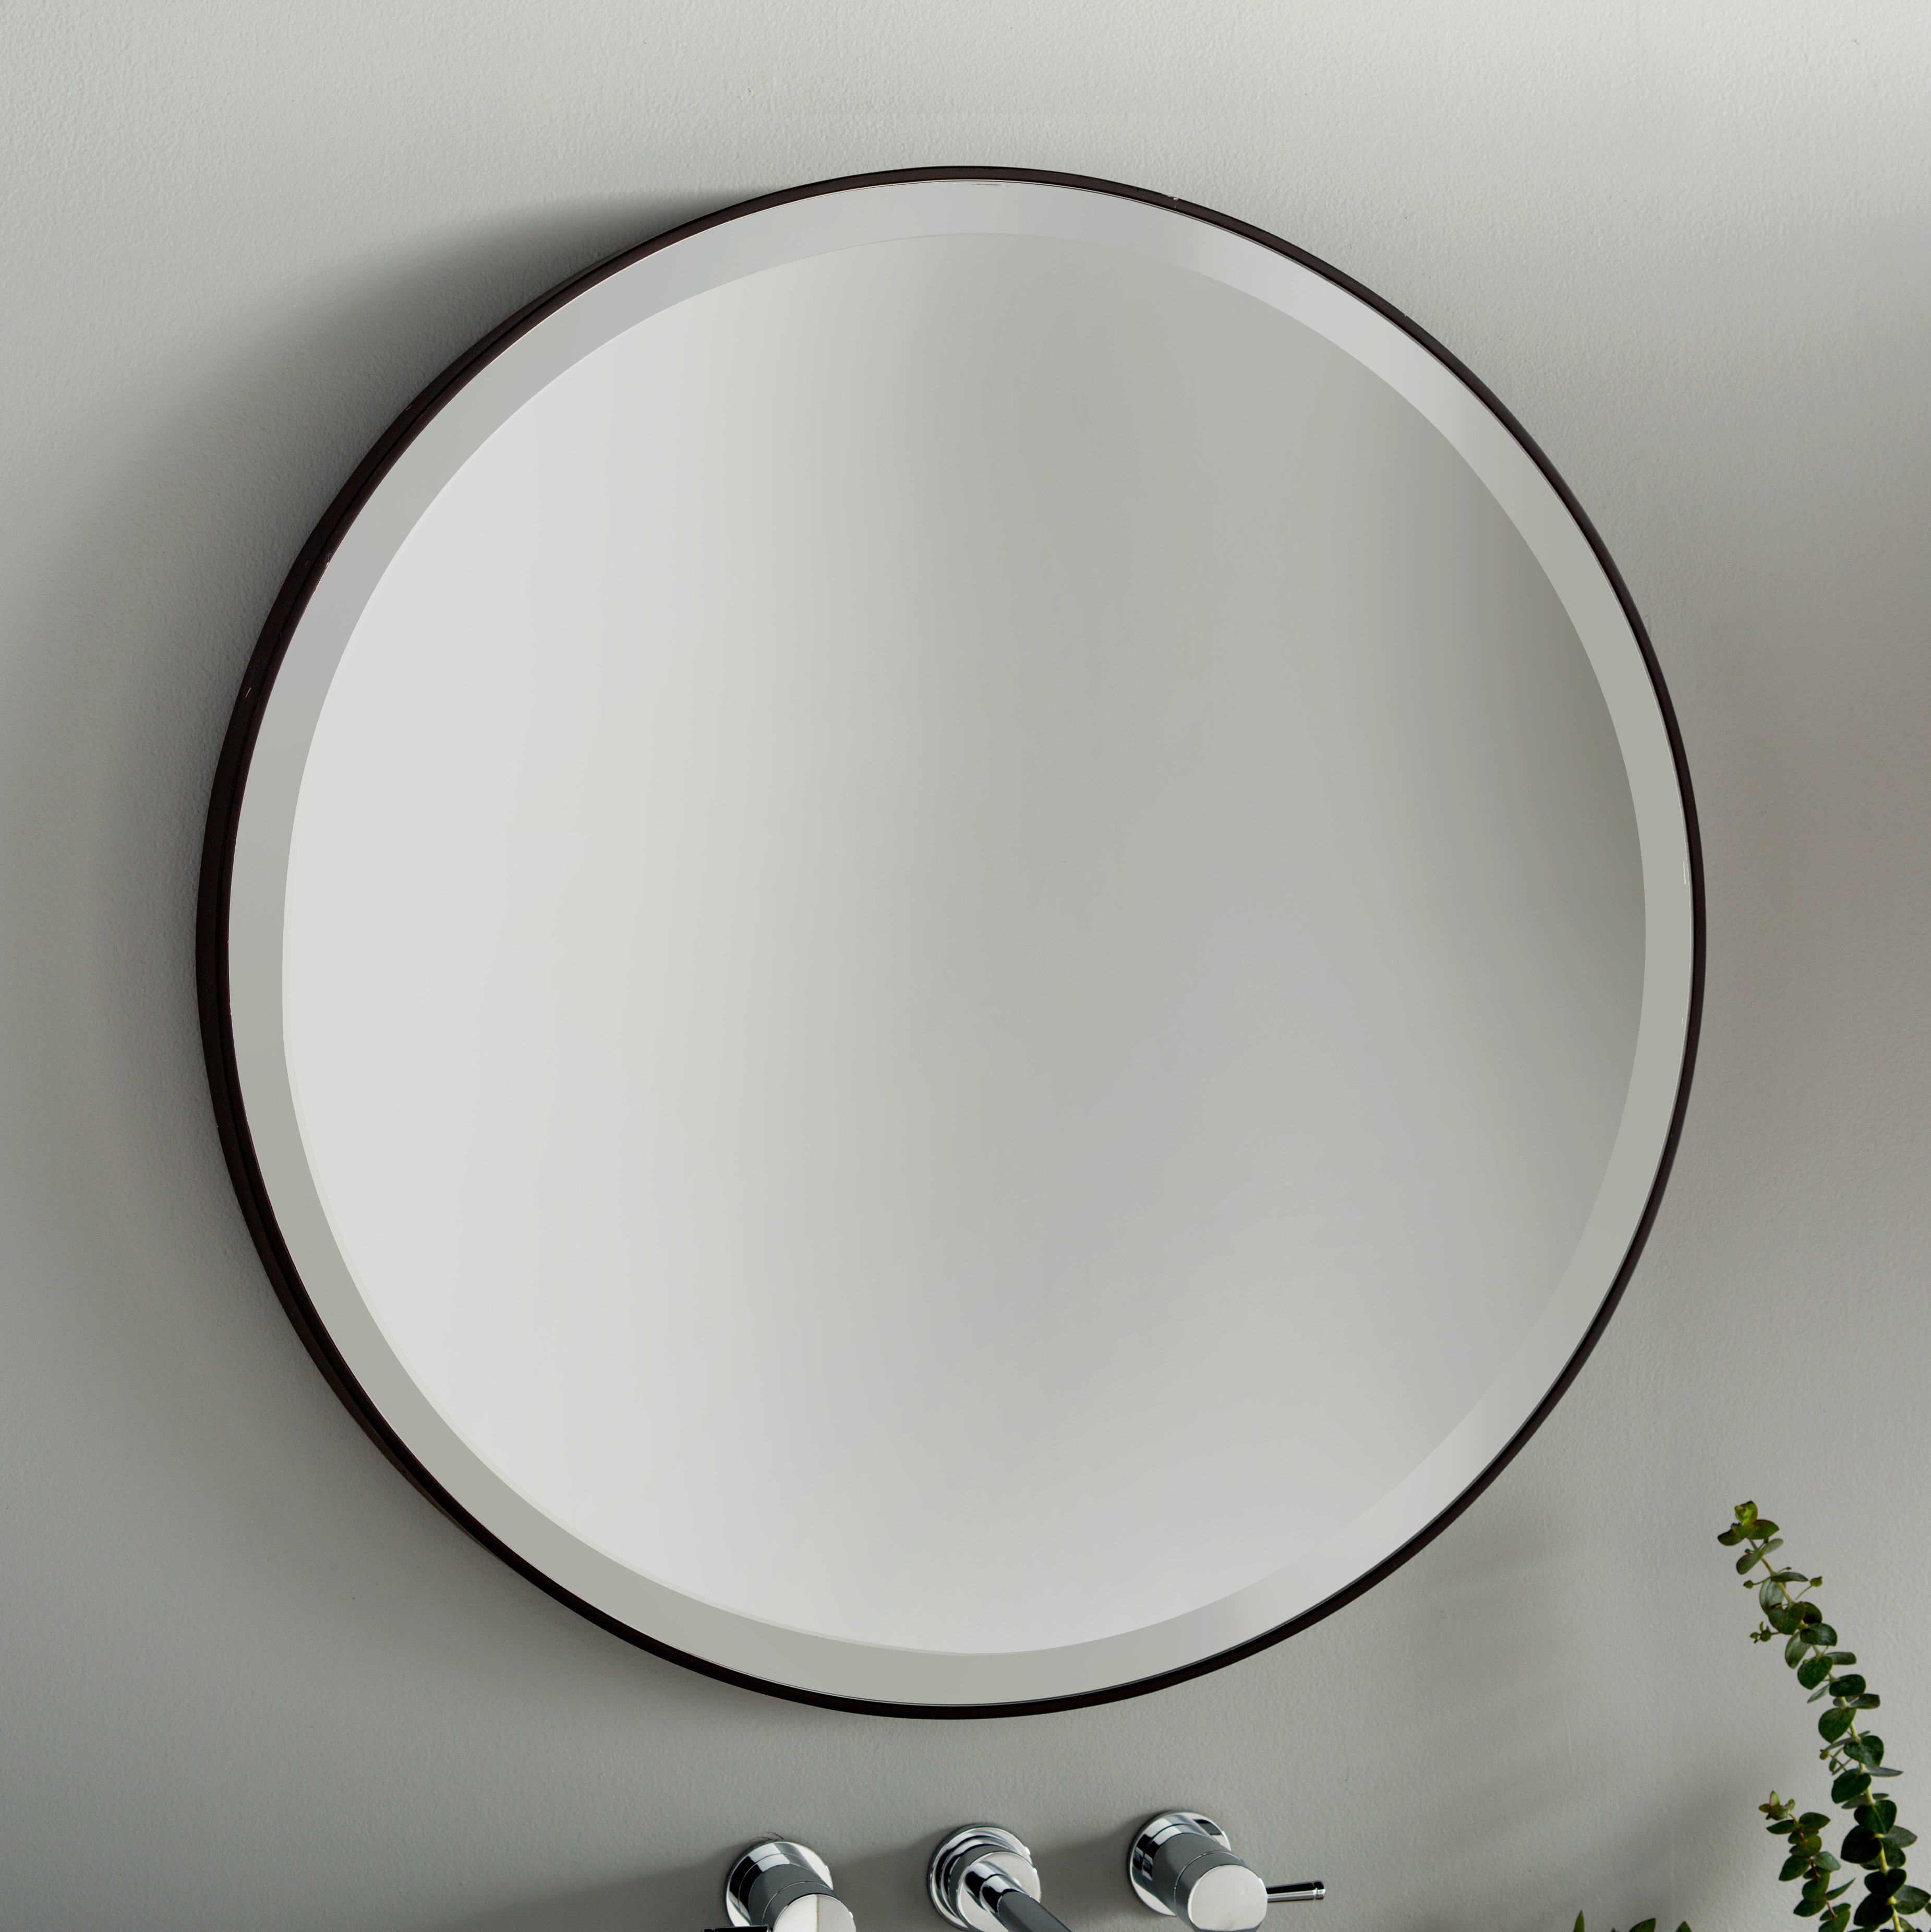 Colton Modern & Contemporary Wall Mirror Inside Colton Modern & Contemporary Wall Mirrors (View 6 of 30)